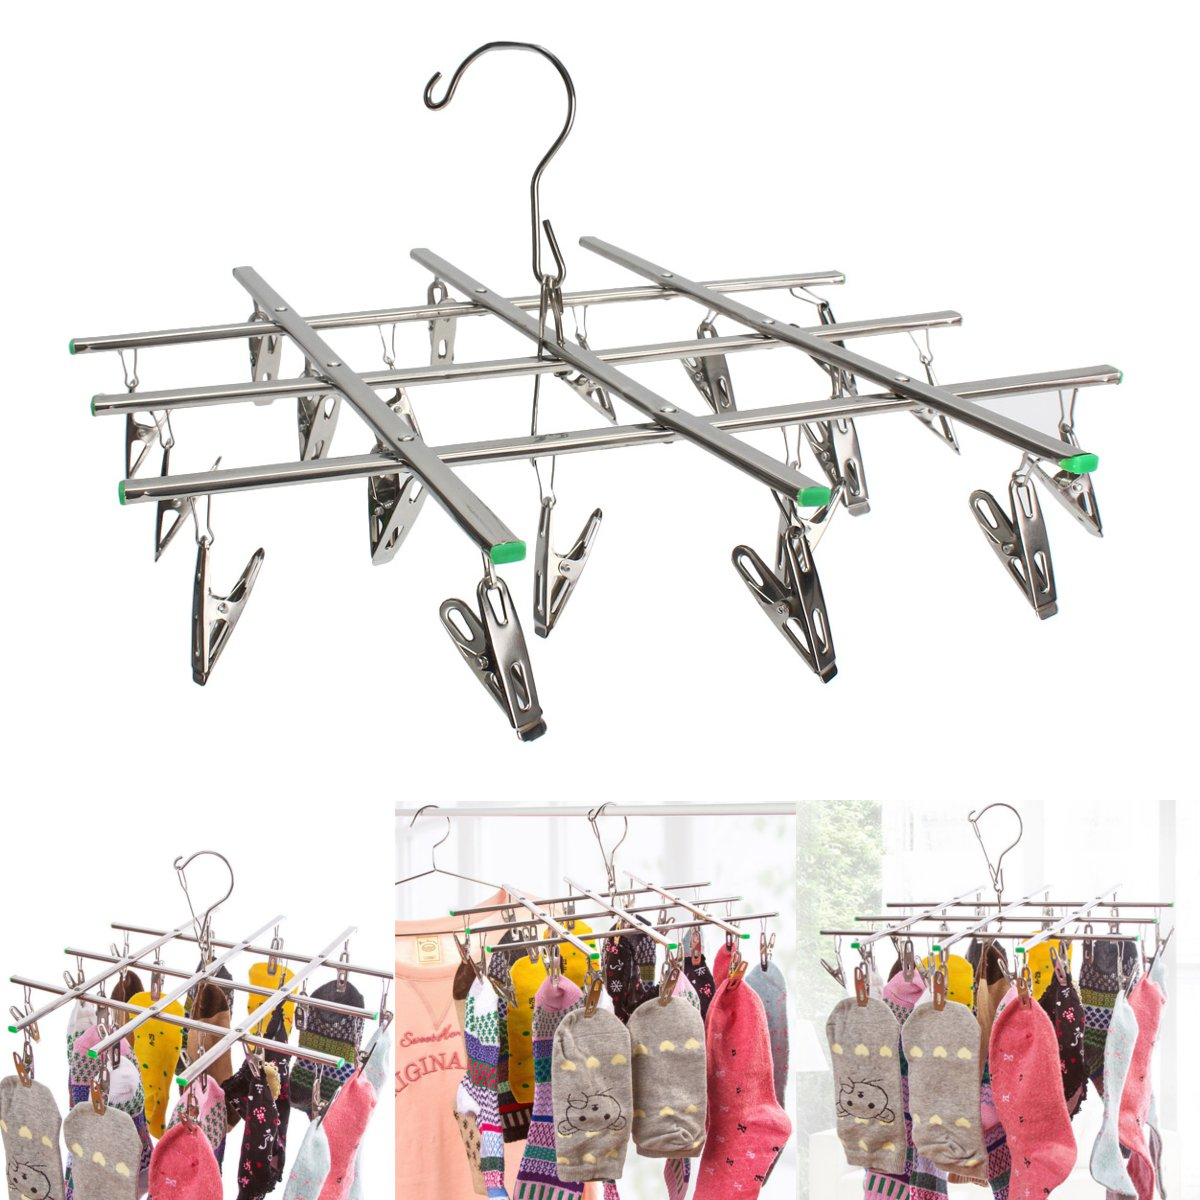 Underwear Socks Tie Laundry Hanger Hook Drying With 16 Pegs Stainless Steel